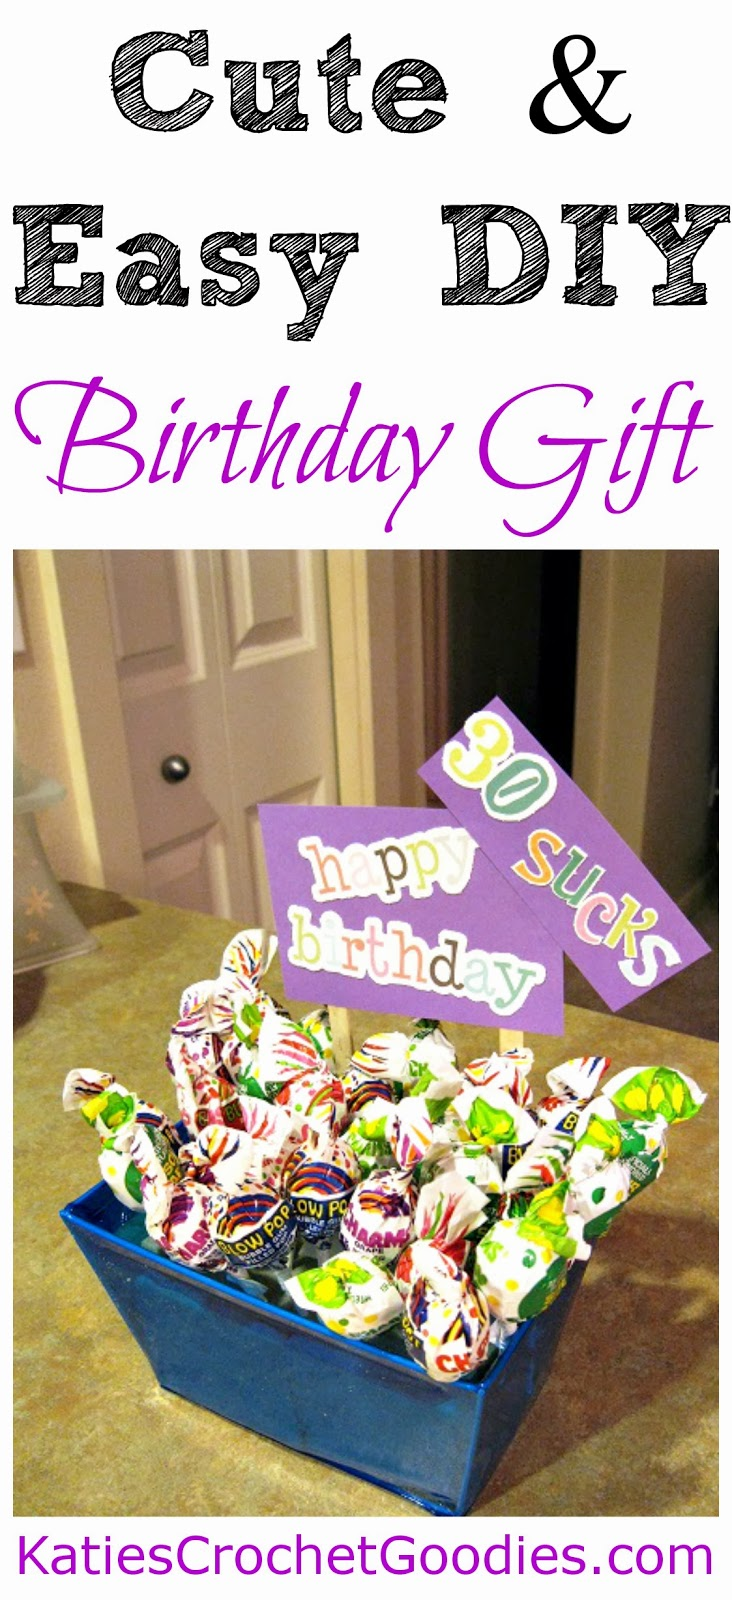 Funny Sucker Birthday Gift Idea - Katie's Crochet Goodies